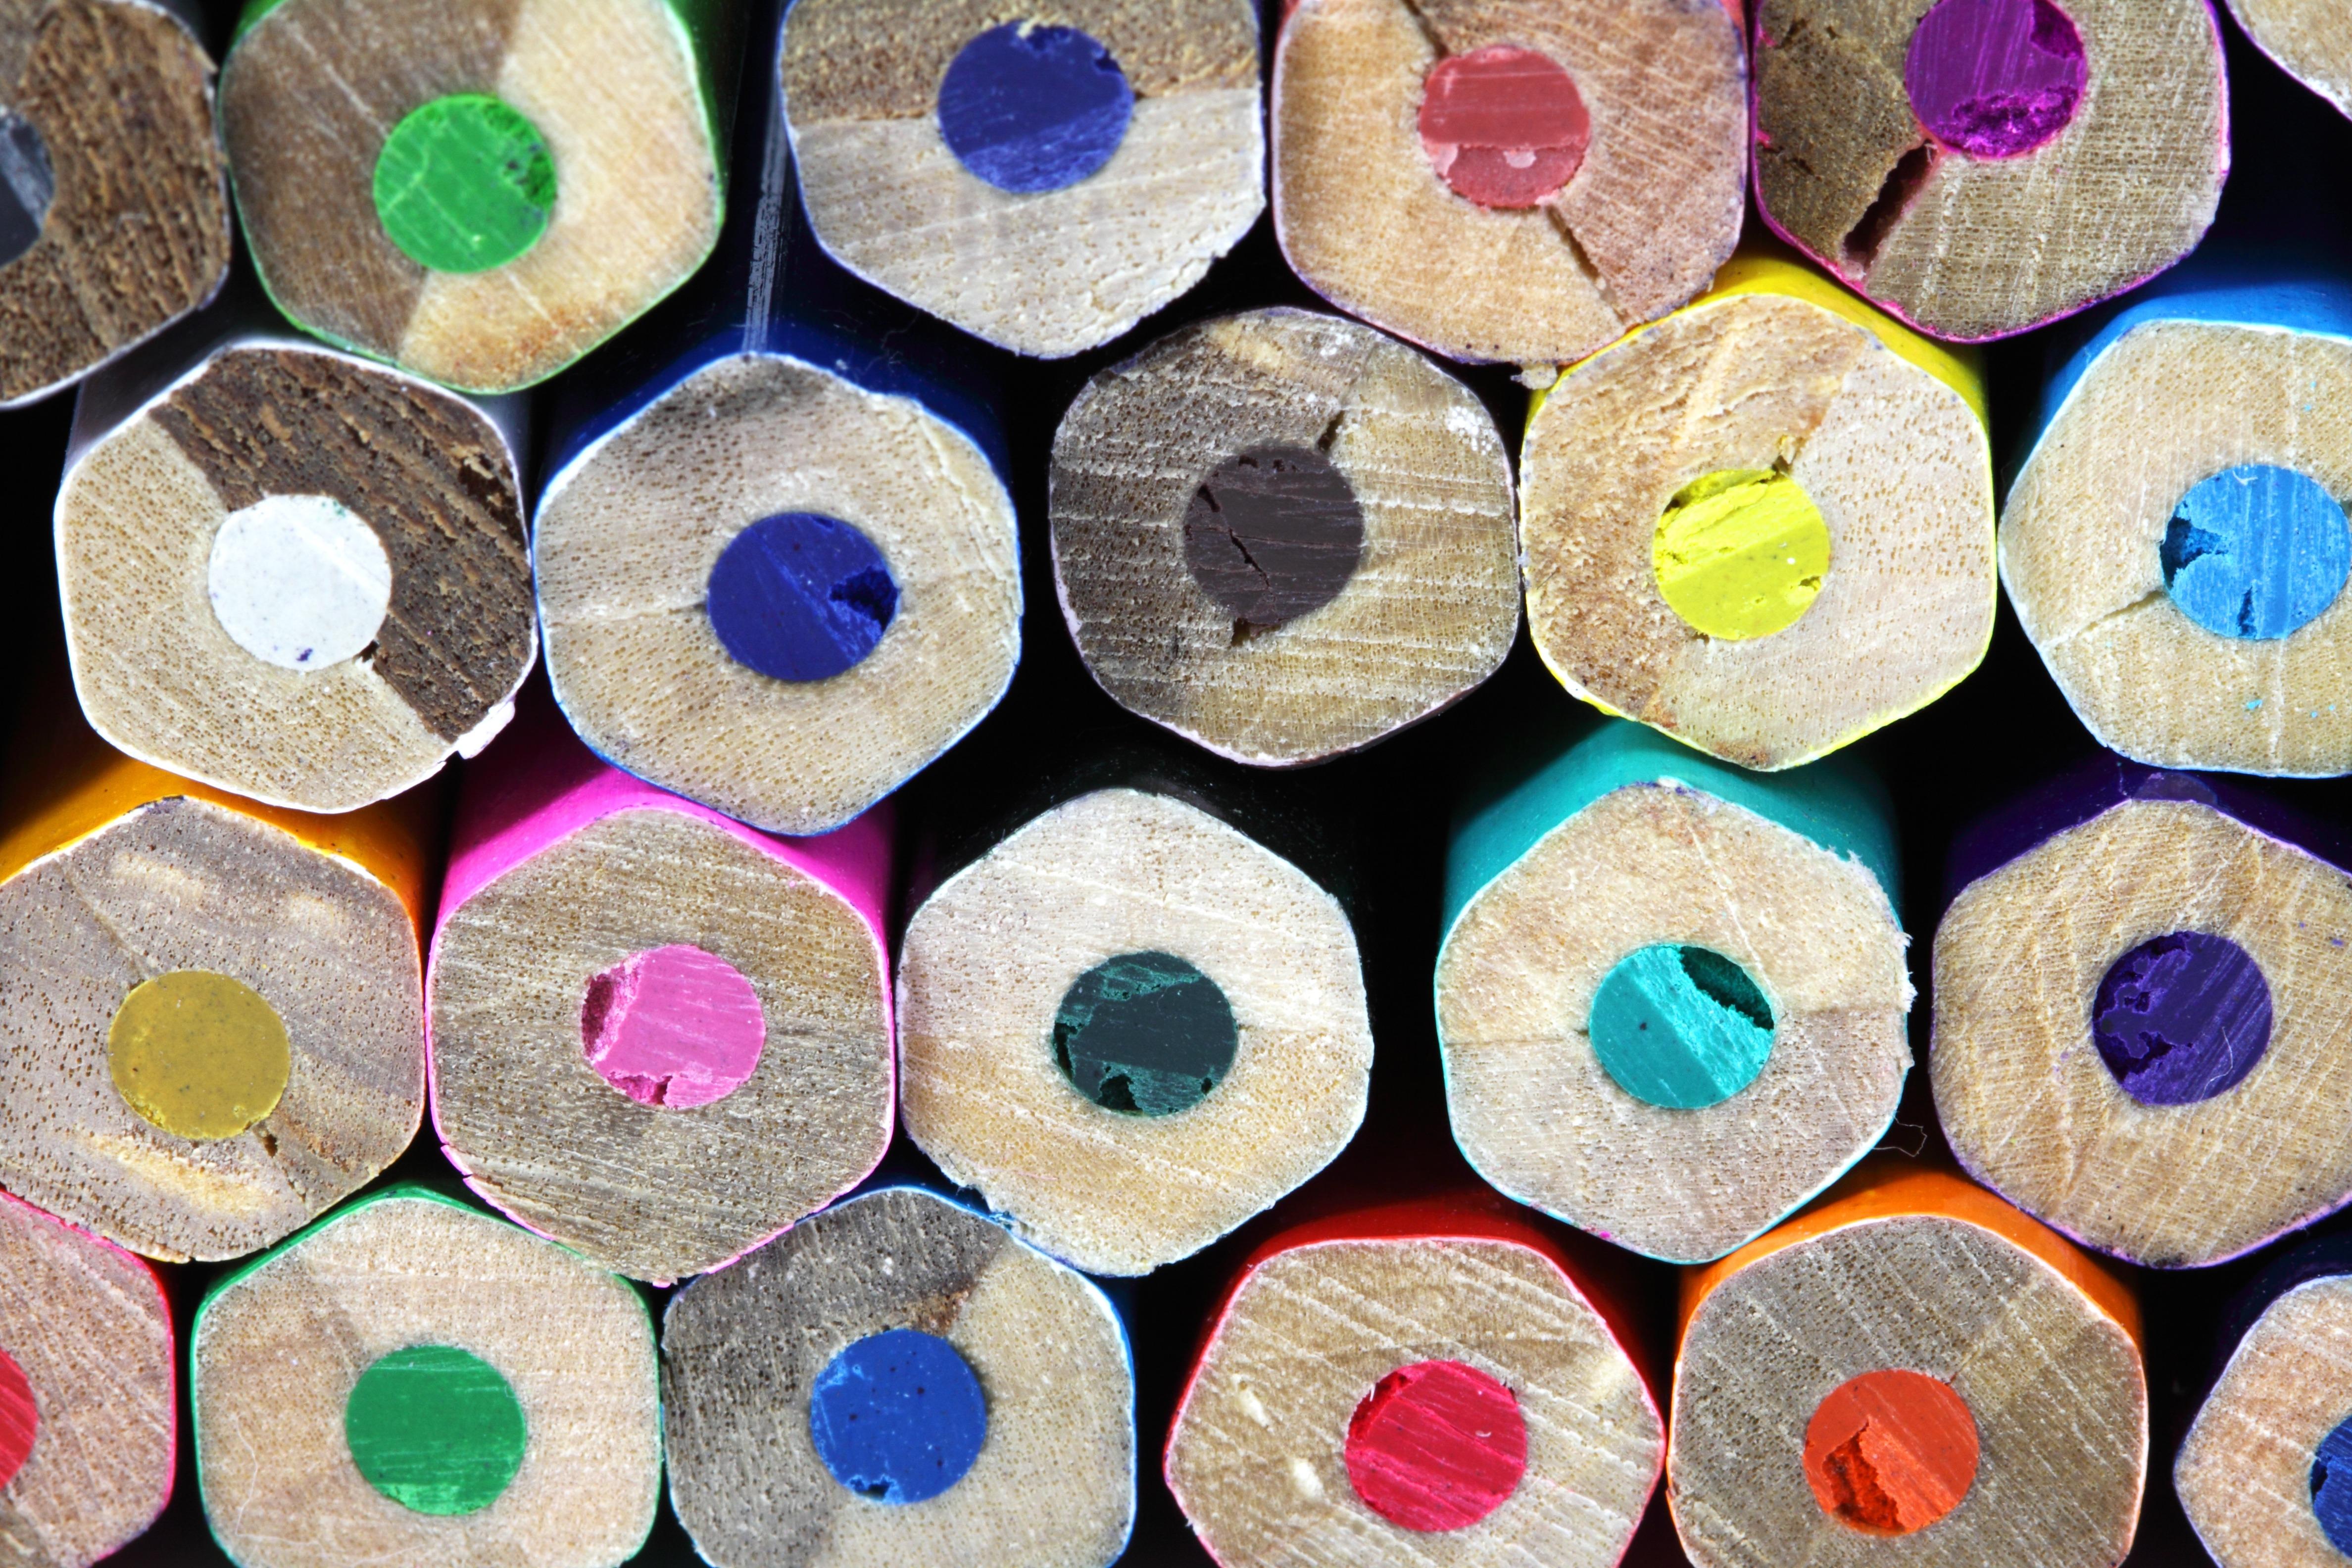 Kostenlose Foto Bleistift Holz Blütenblatt Nummer Farbe